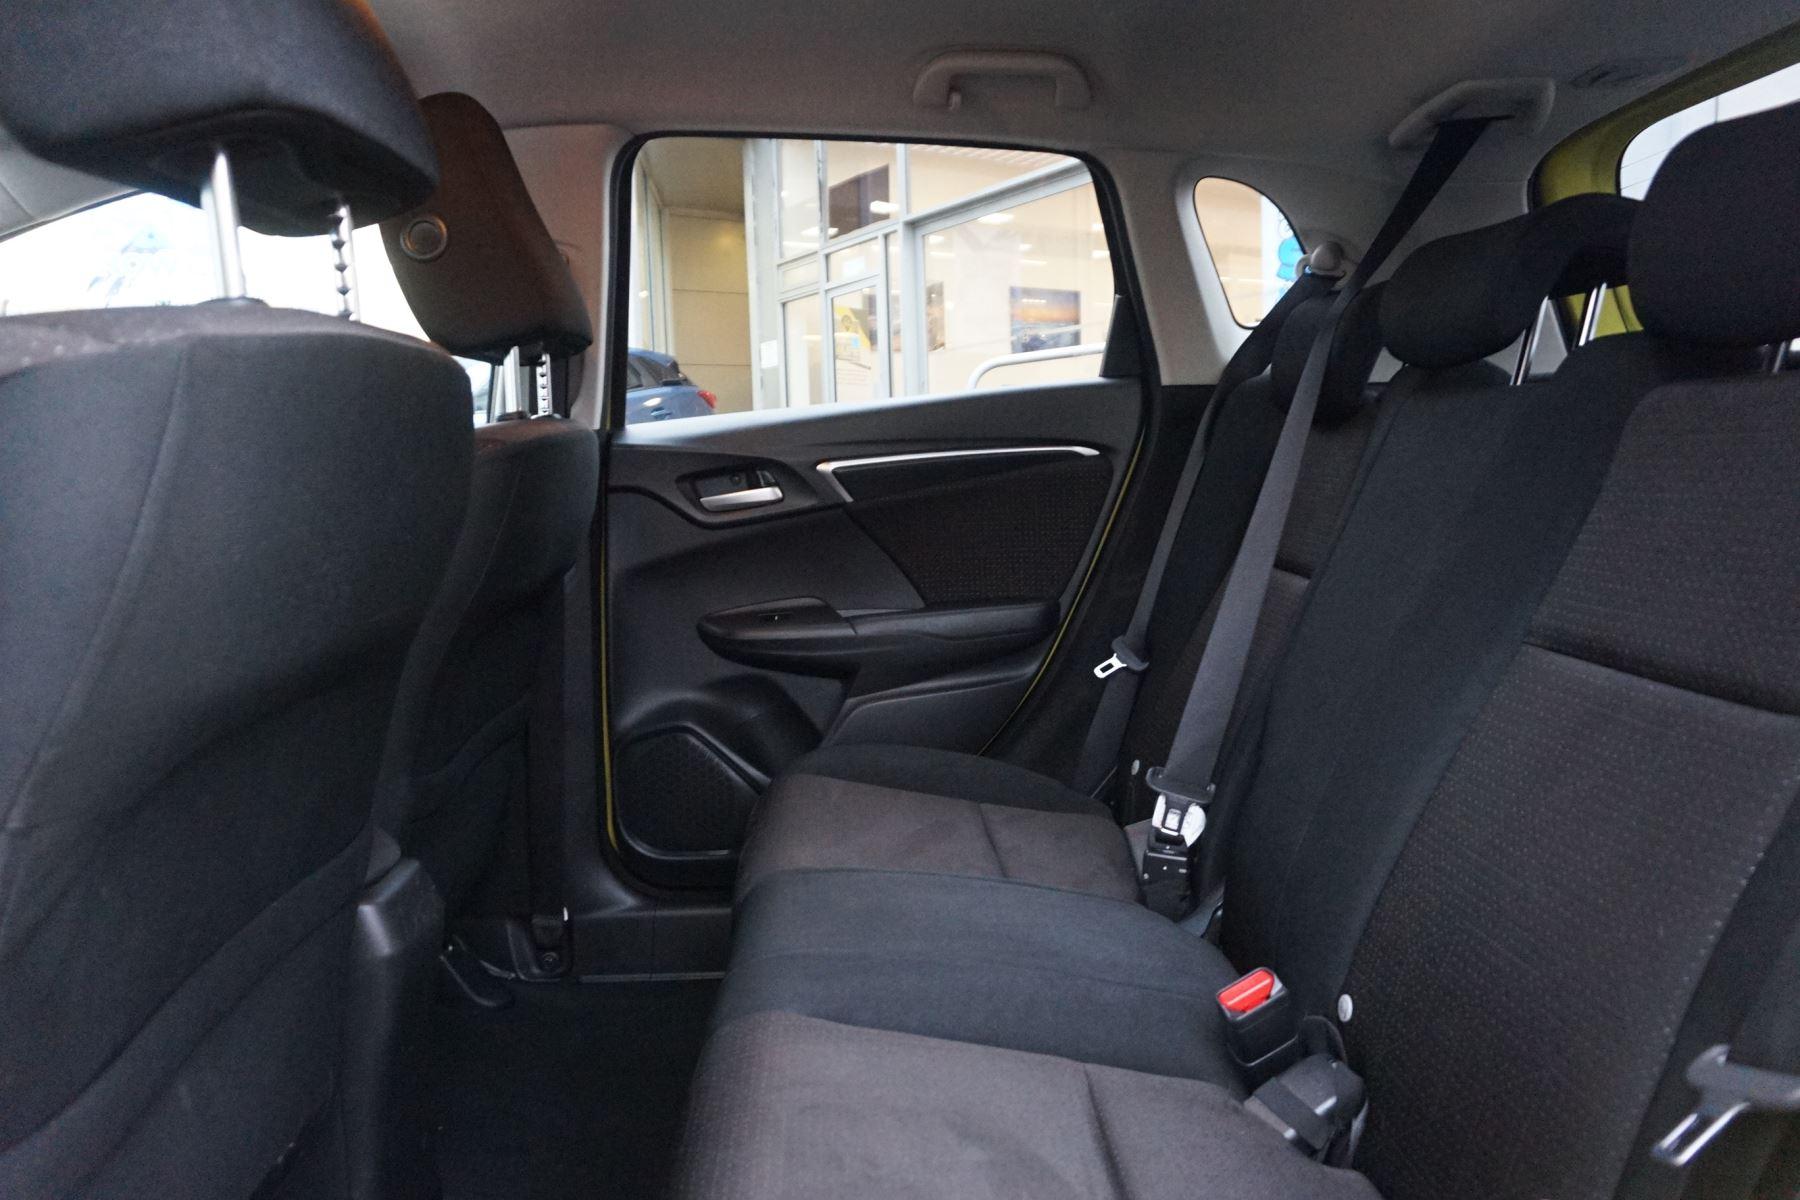 Honda Jazz 1.3 EX 5dr image 8